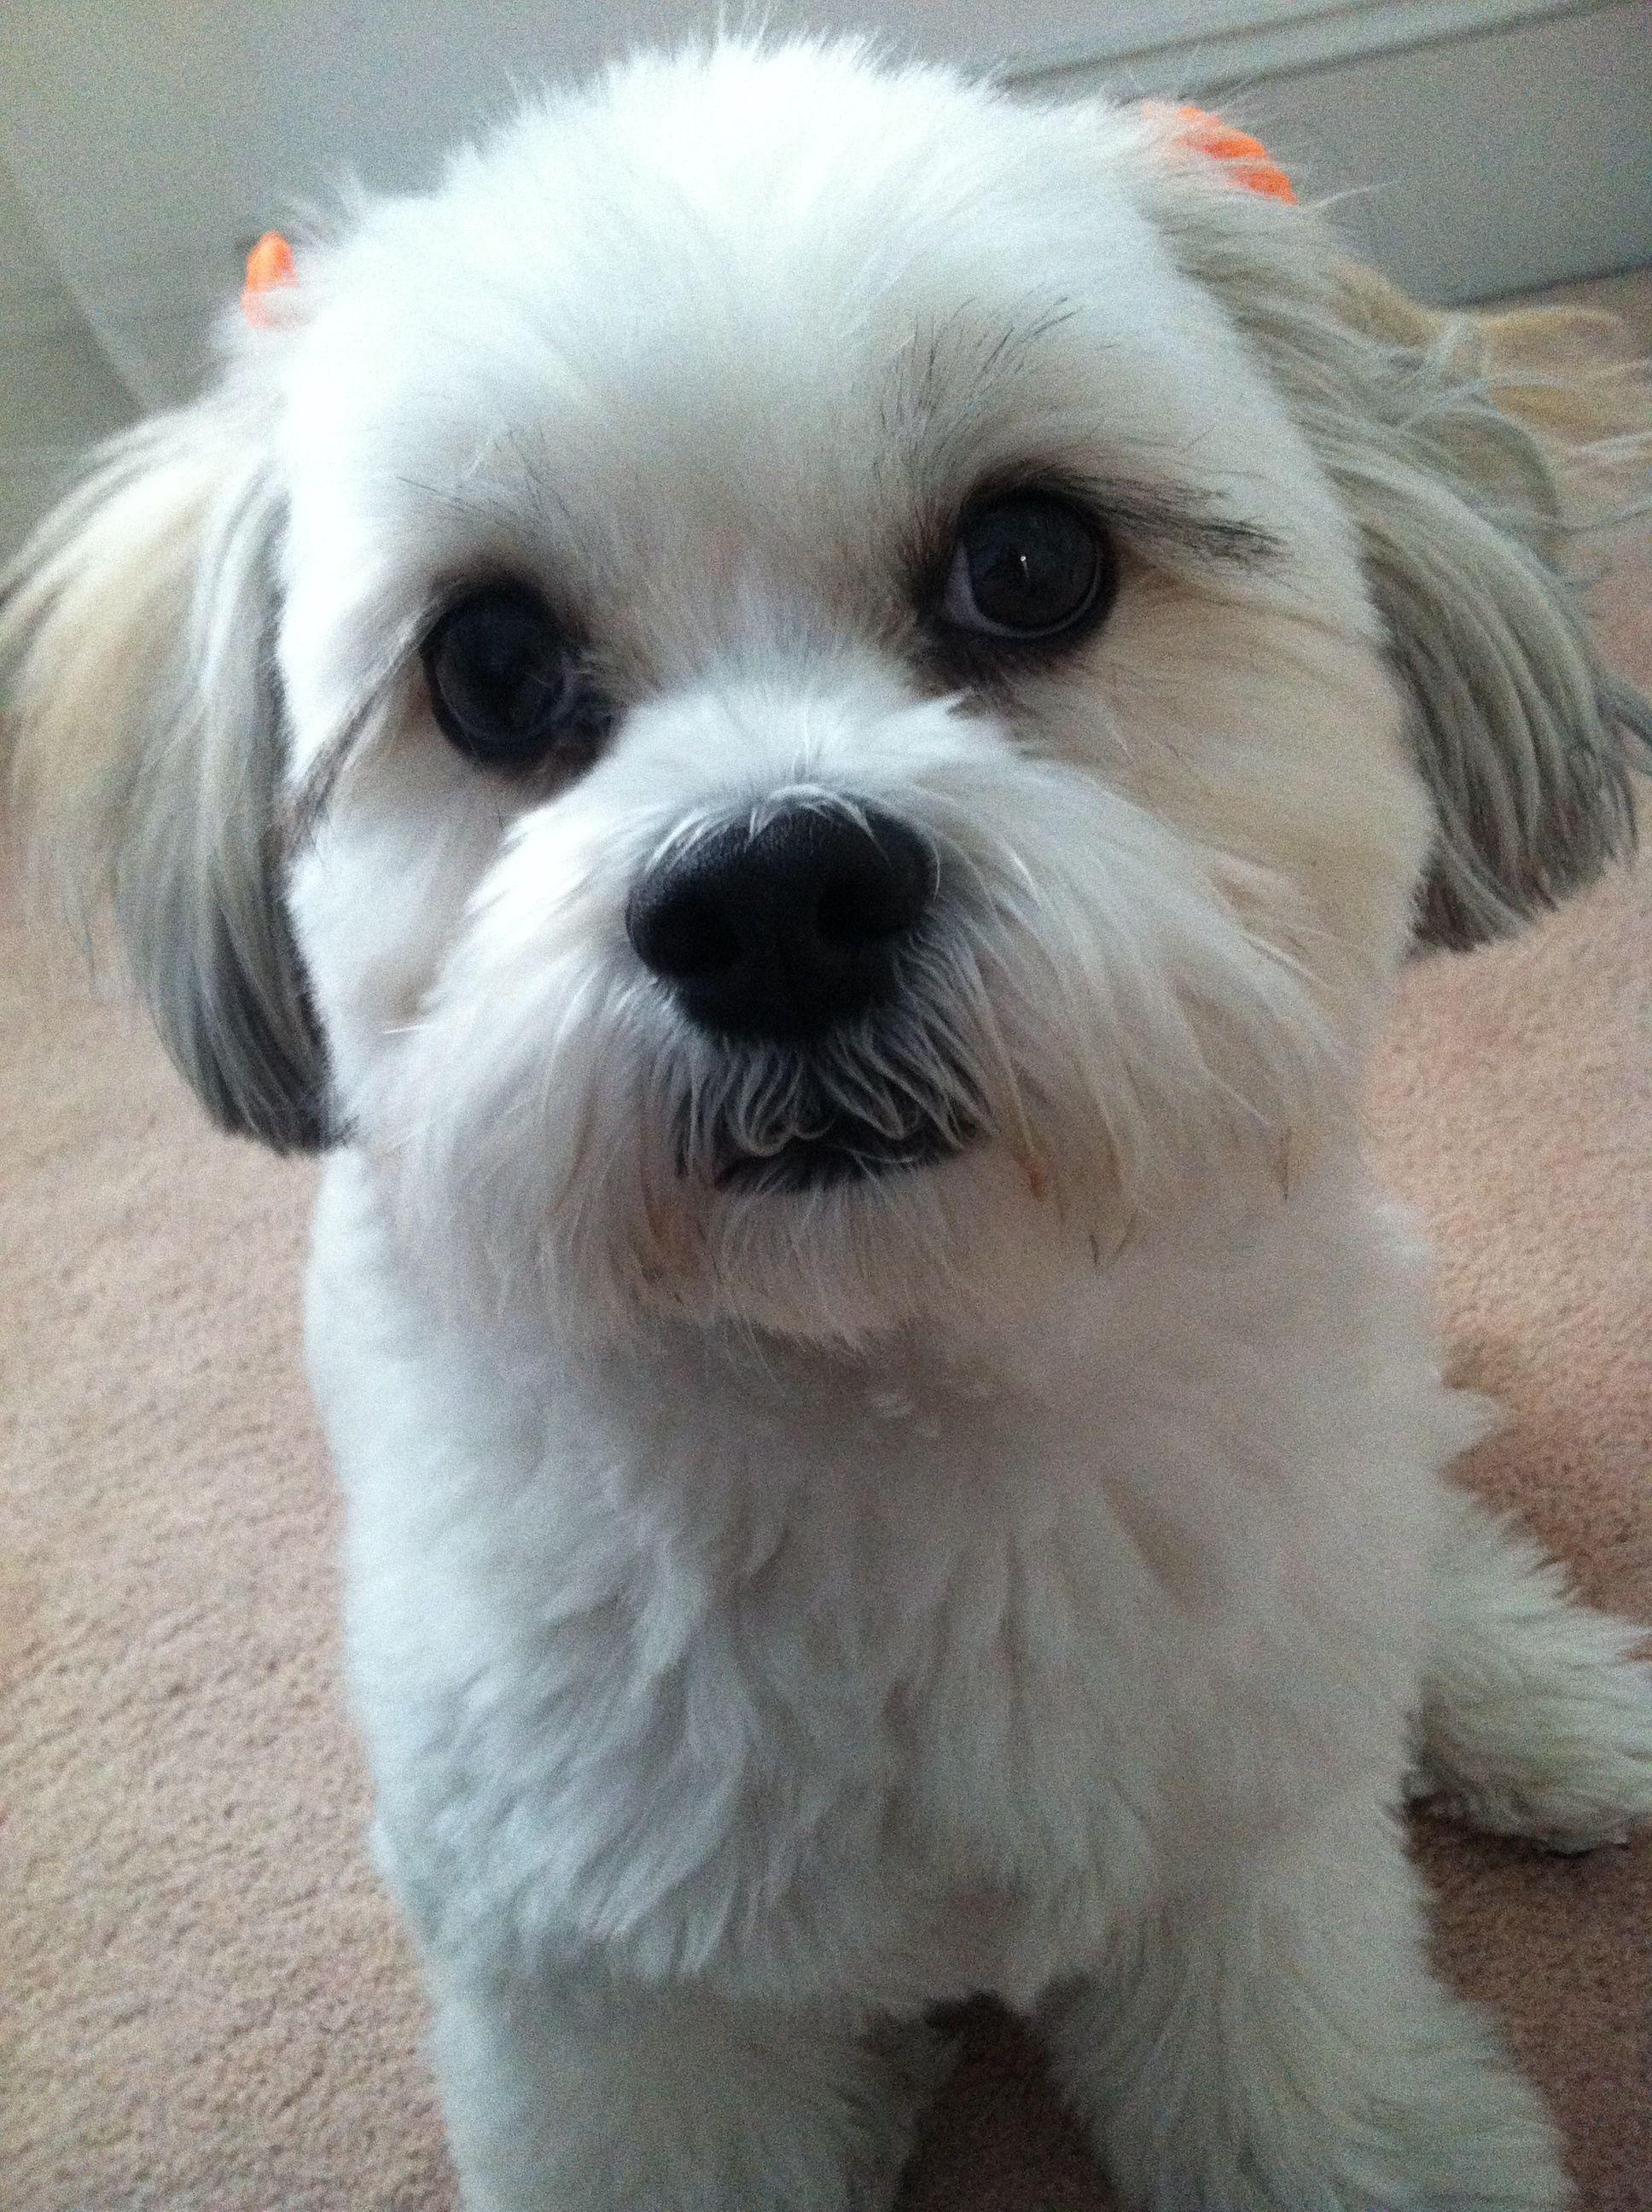 Bichon Shih Tzu So Cute Puppies Pinterest See